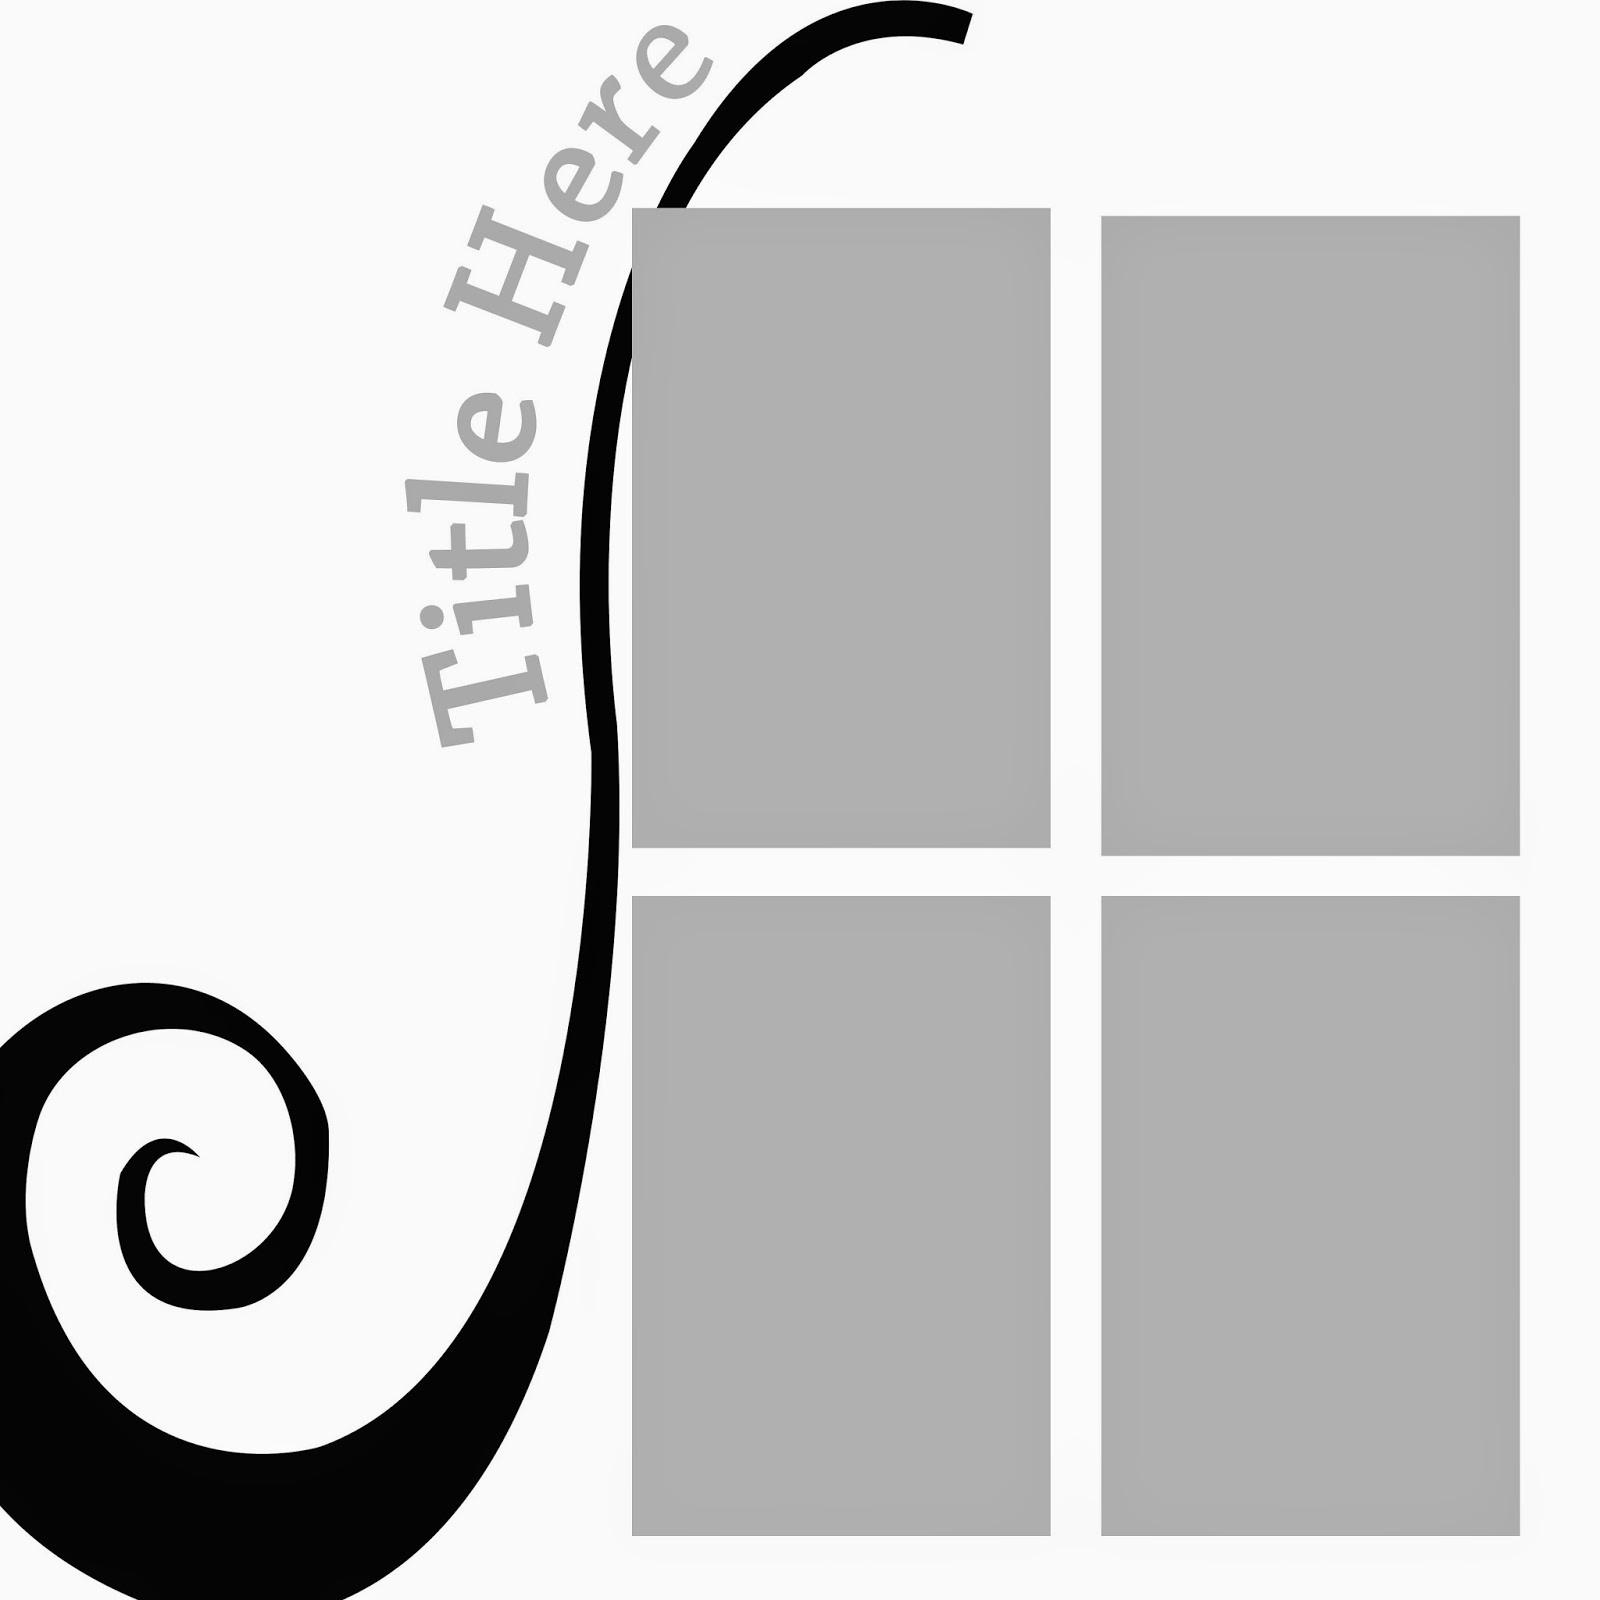 http://1.bp.blogspot.com/-f7lL6LYE6jI/Uz8GkDVwpfI/AAAAAAAACac/TrjEyBHcByA/s1600/Sketch+5.jpg